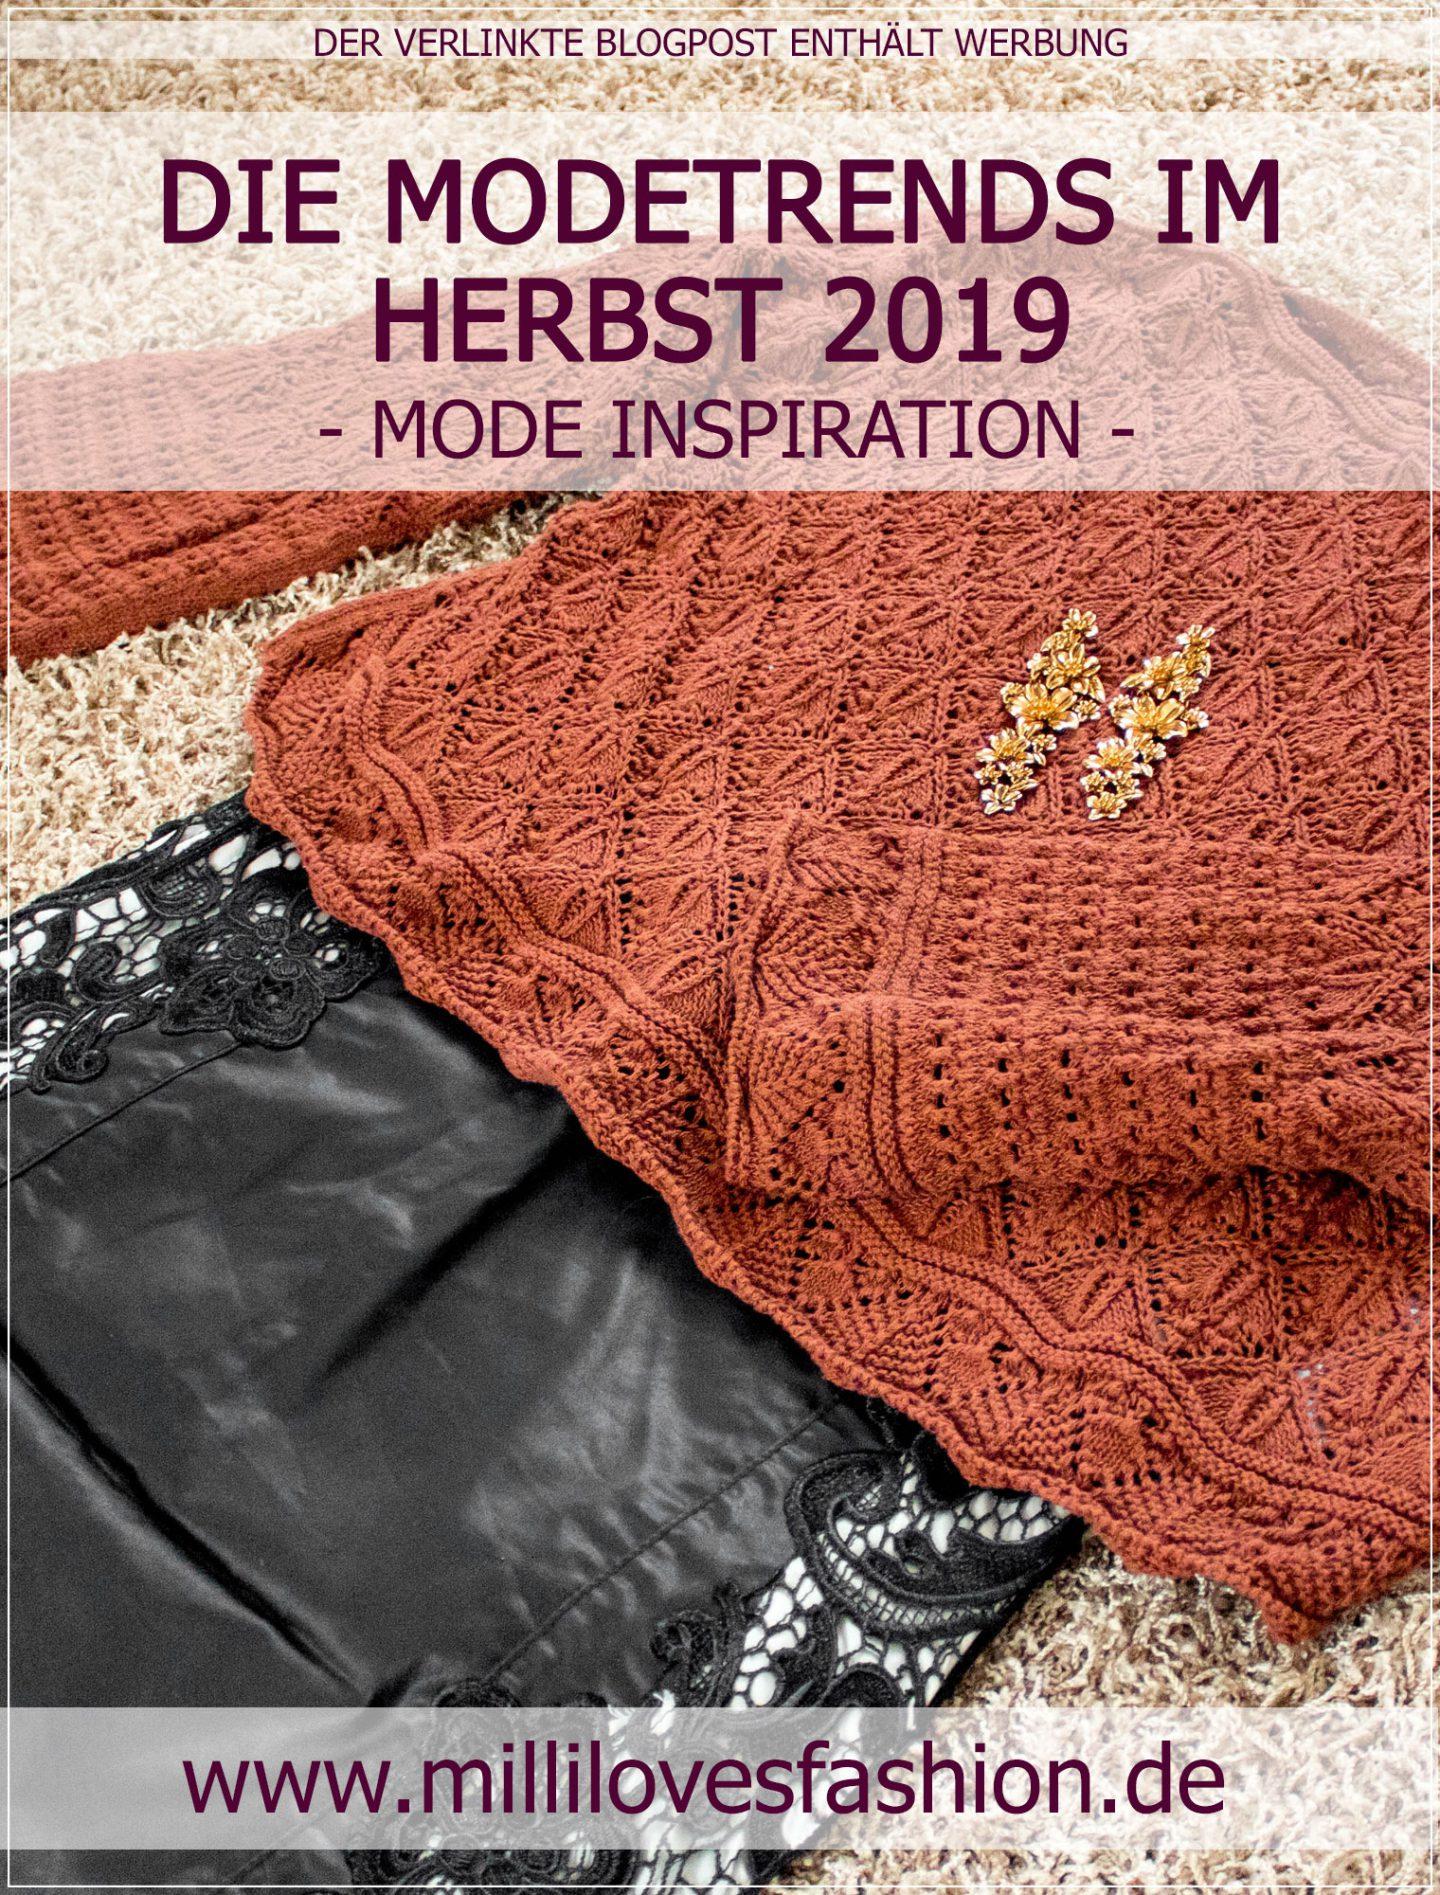 Herbsttrends, Modetrends, Fashion, Modeblog, Ruhrgebiet, Herbstmode, Bloggerin, Fashionblog